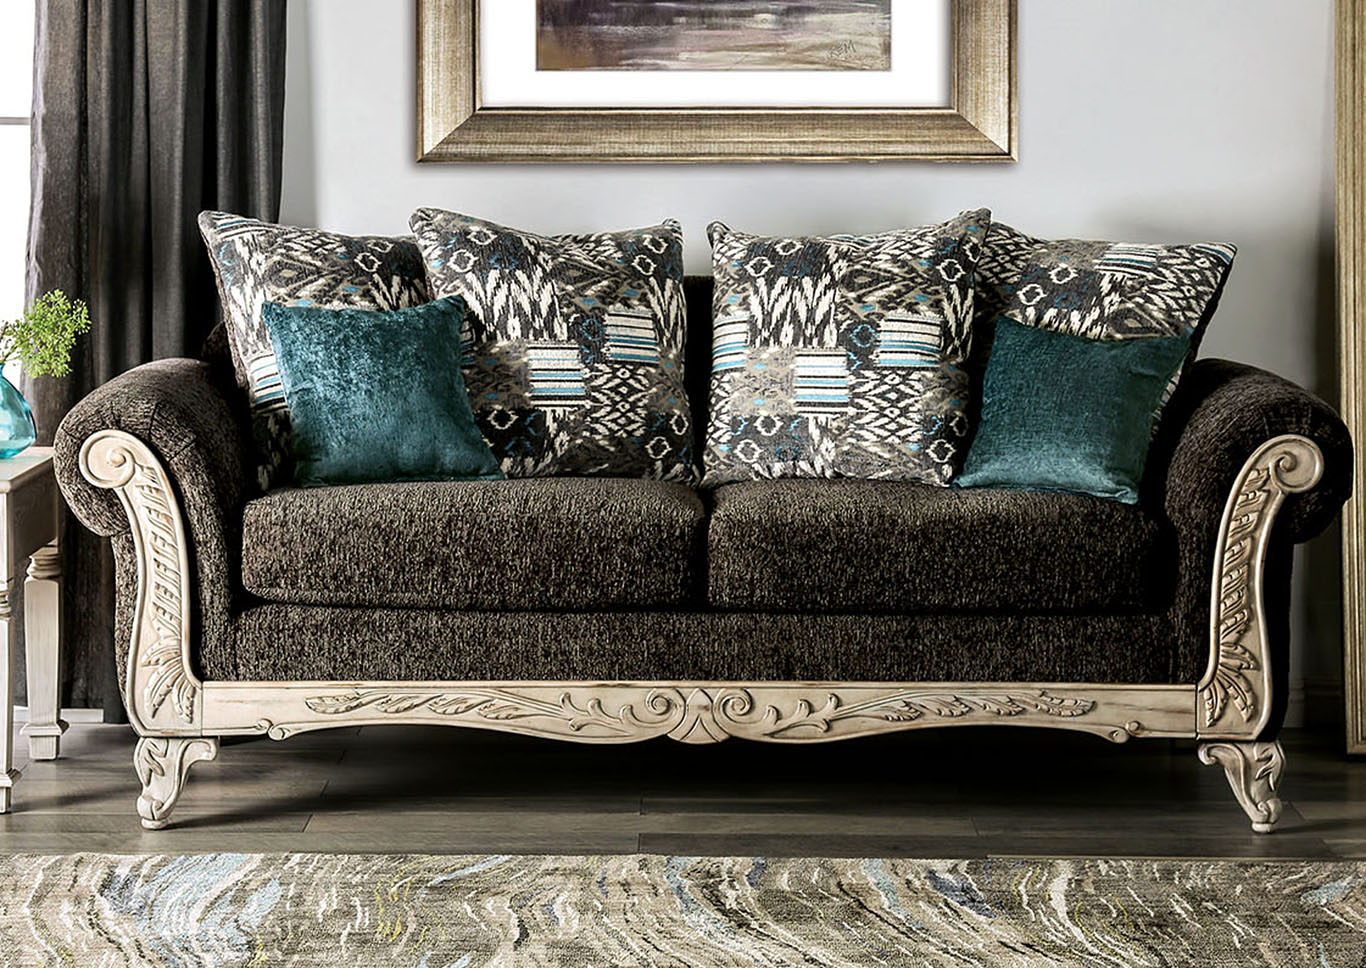 Peaceful Living Furniture Cerise Black Sofa & Loveseat